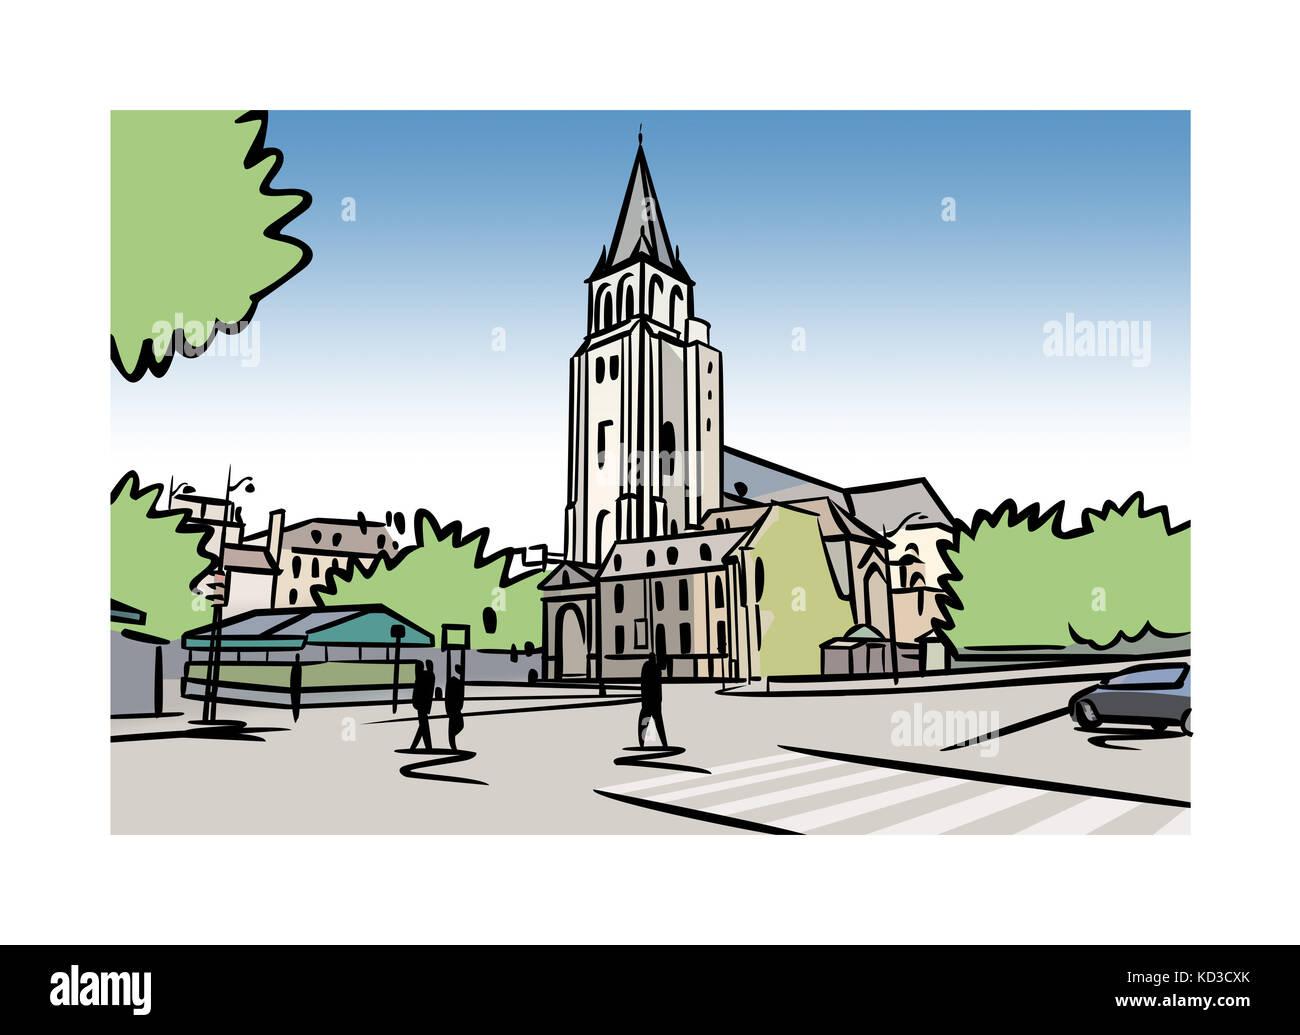 Illustration of the Abbey of Saint-Germain-des-PrŽs in Paris, France Stock Photo